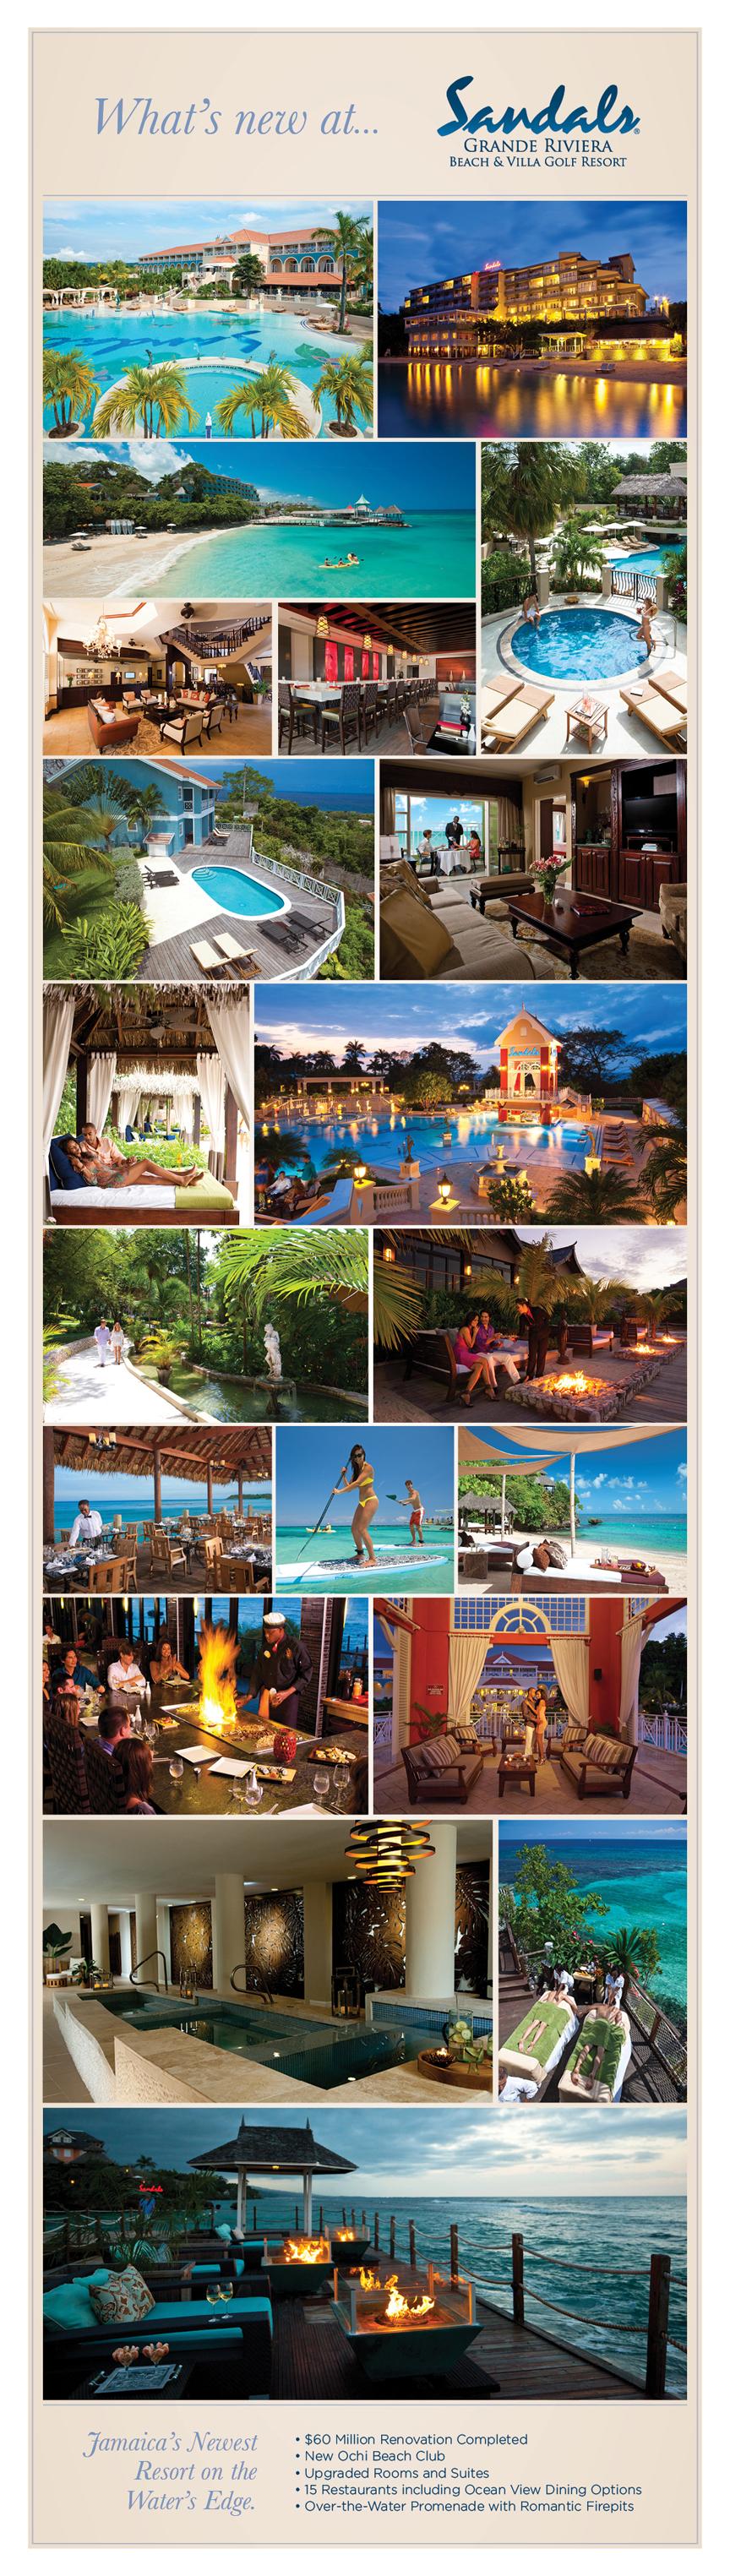 Beach wedding spots  Favorite resort in Jamaica  Sandals Grande Riviera  About me